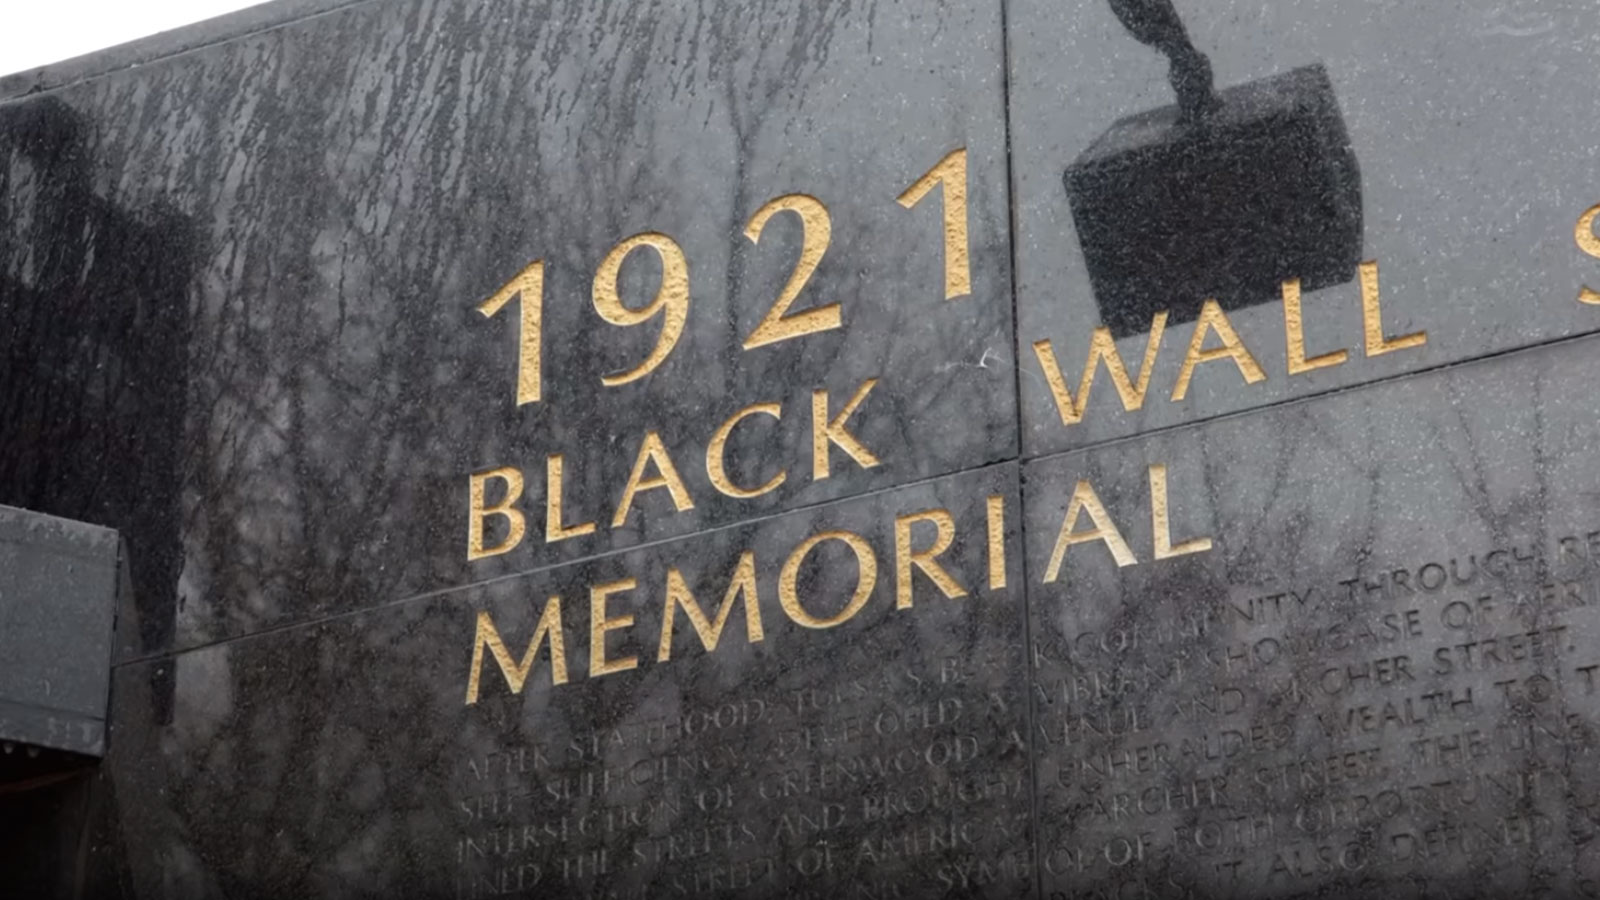 Black Wall Street Memorial Wall